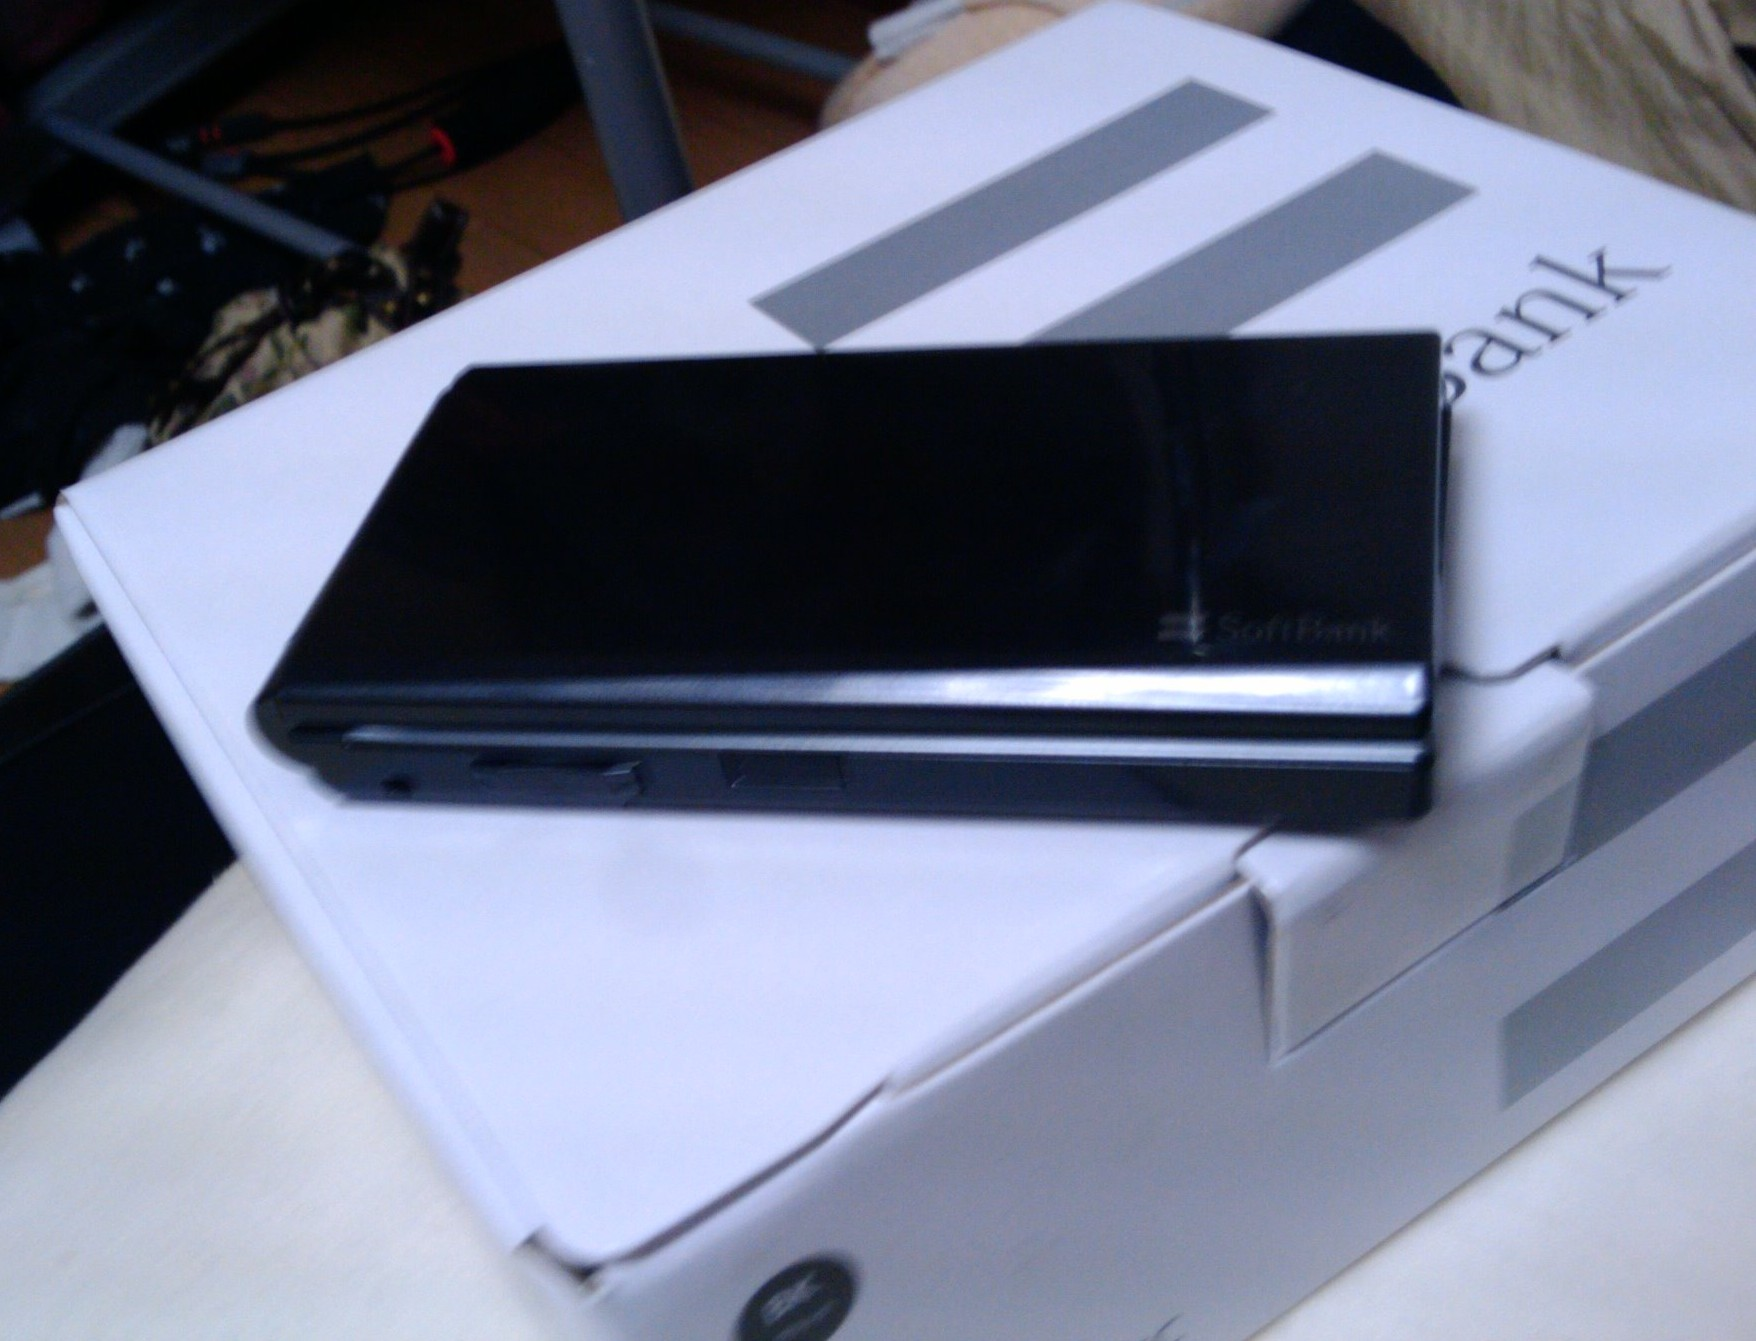 softbankphone